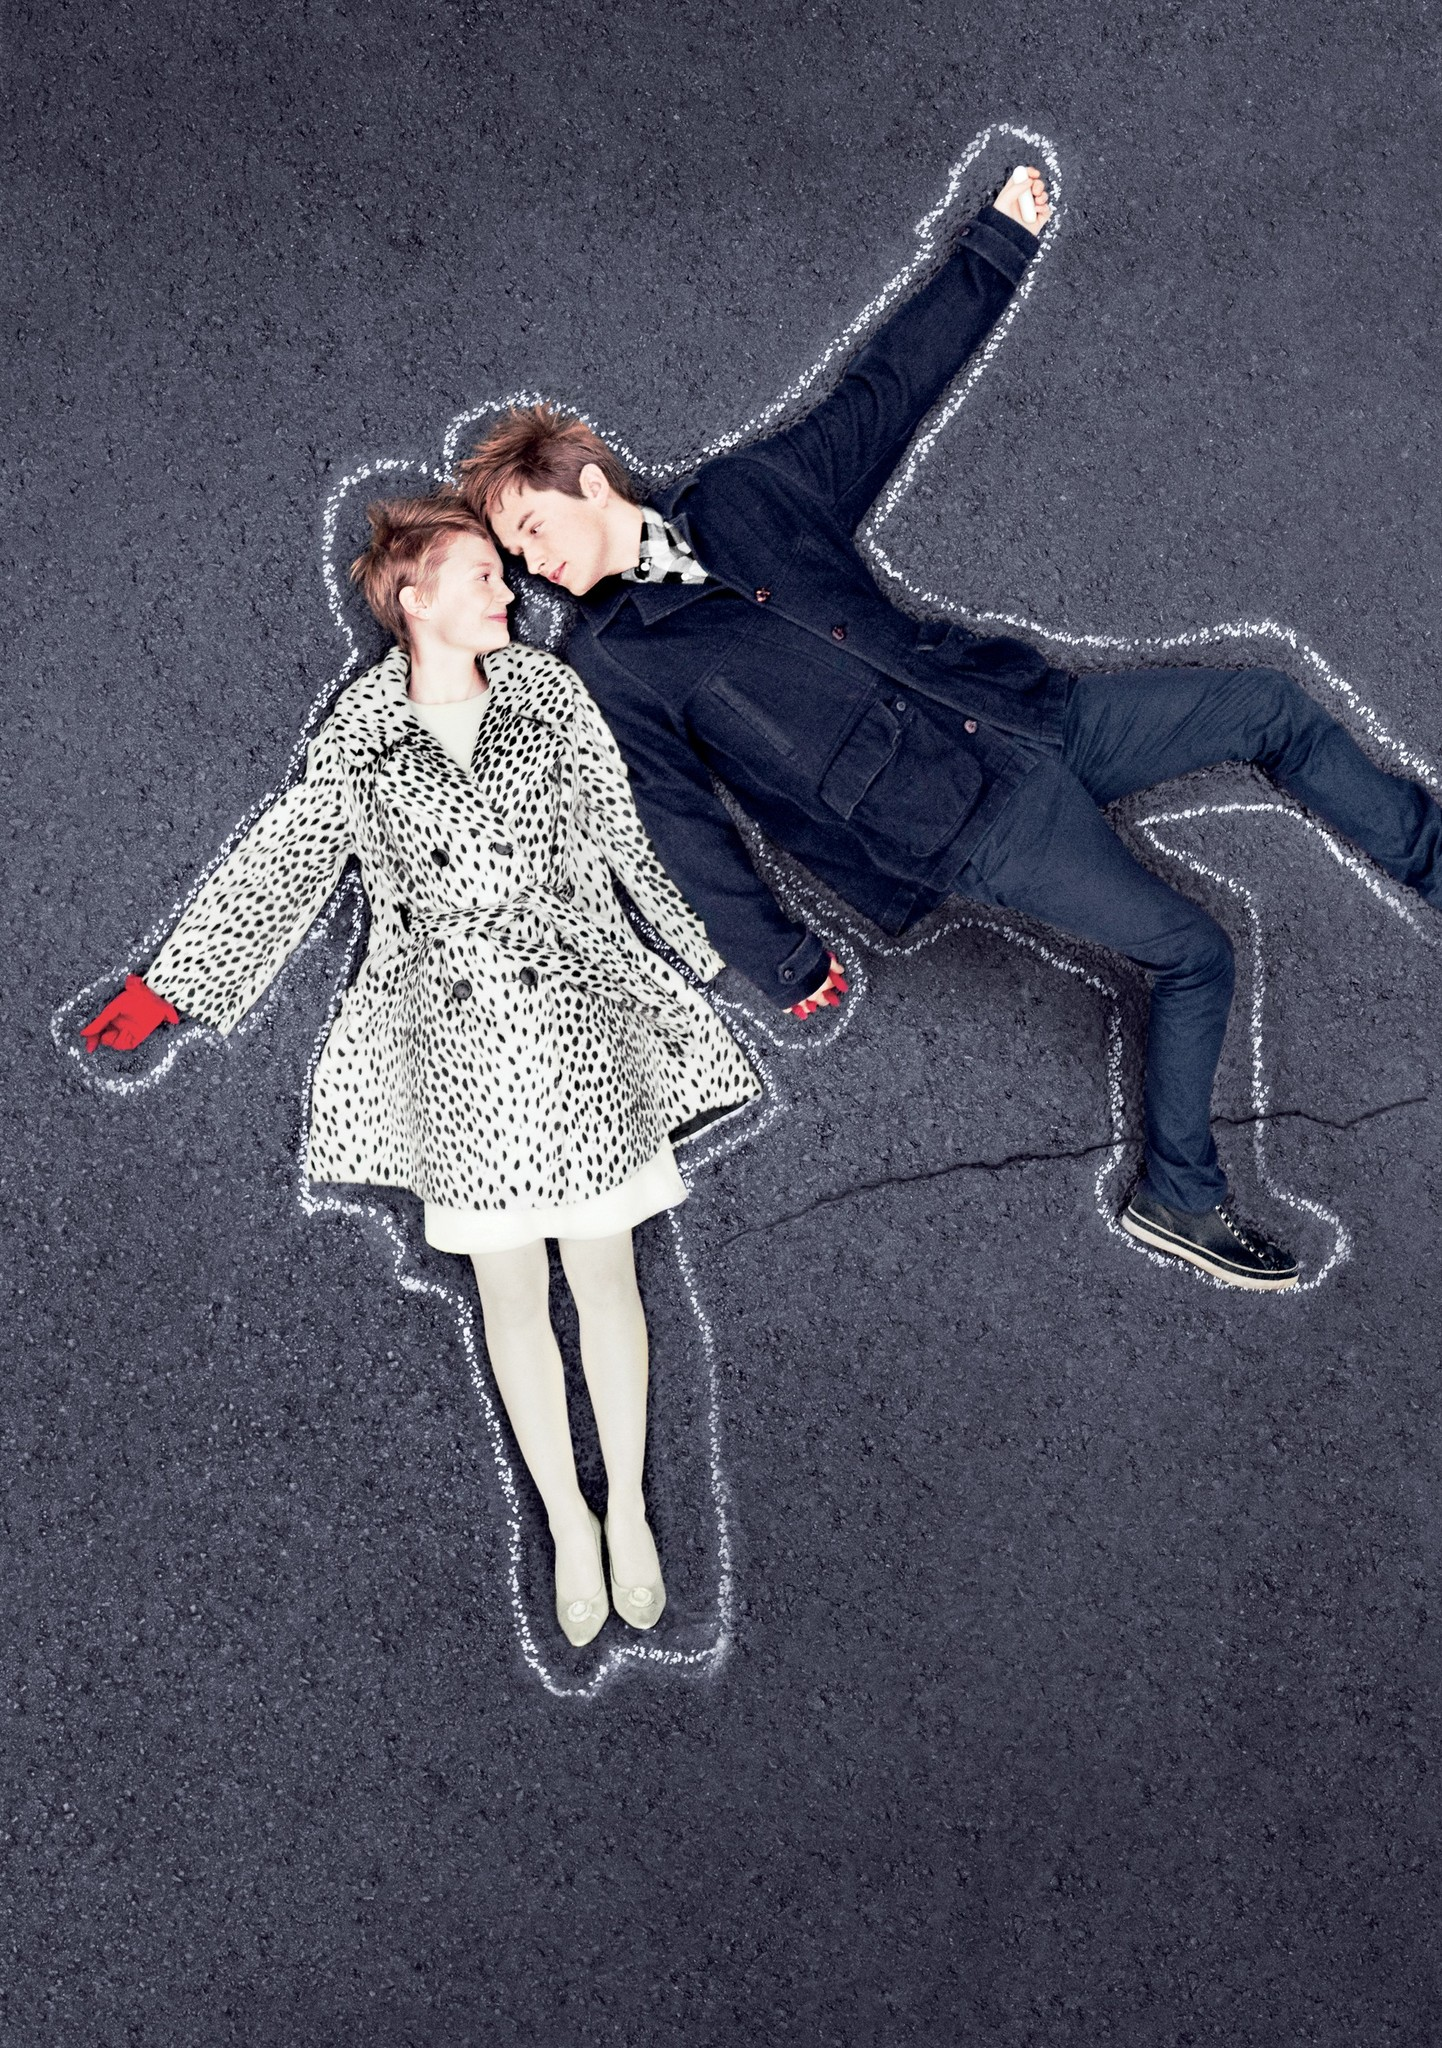 Still of Henry Hopper and Mia Wasikowska in Restless (2011)